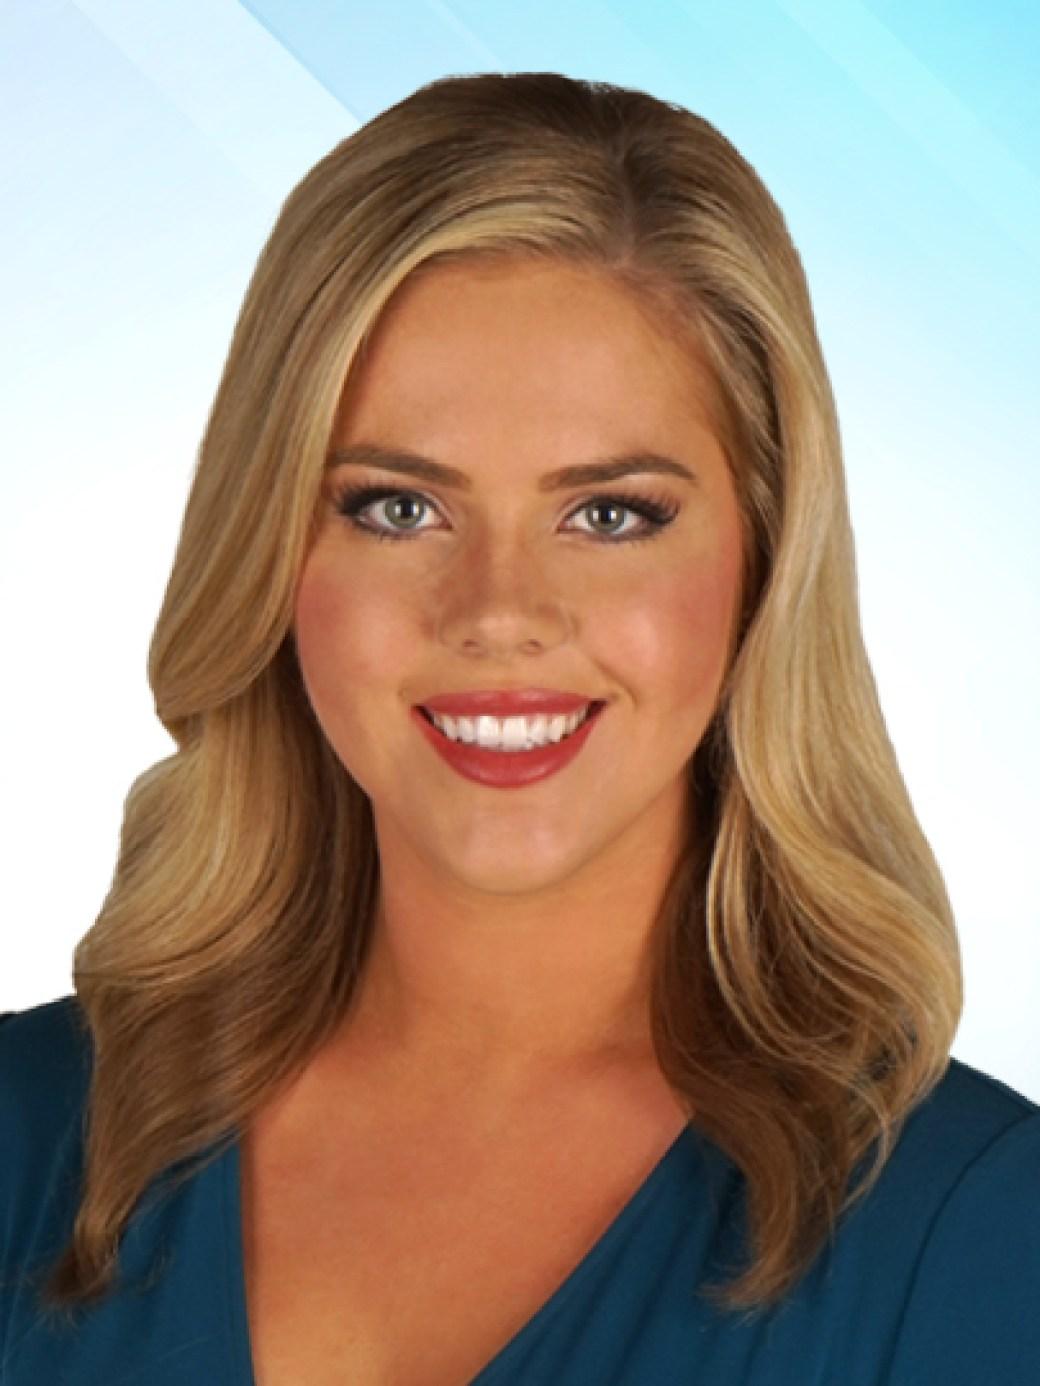 Victoria Price